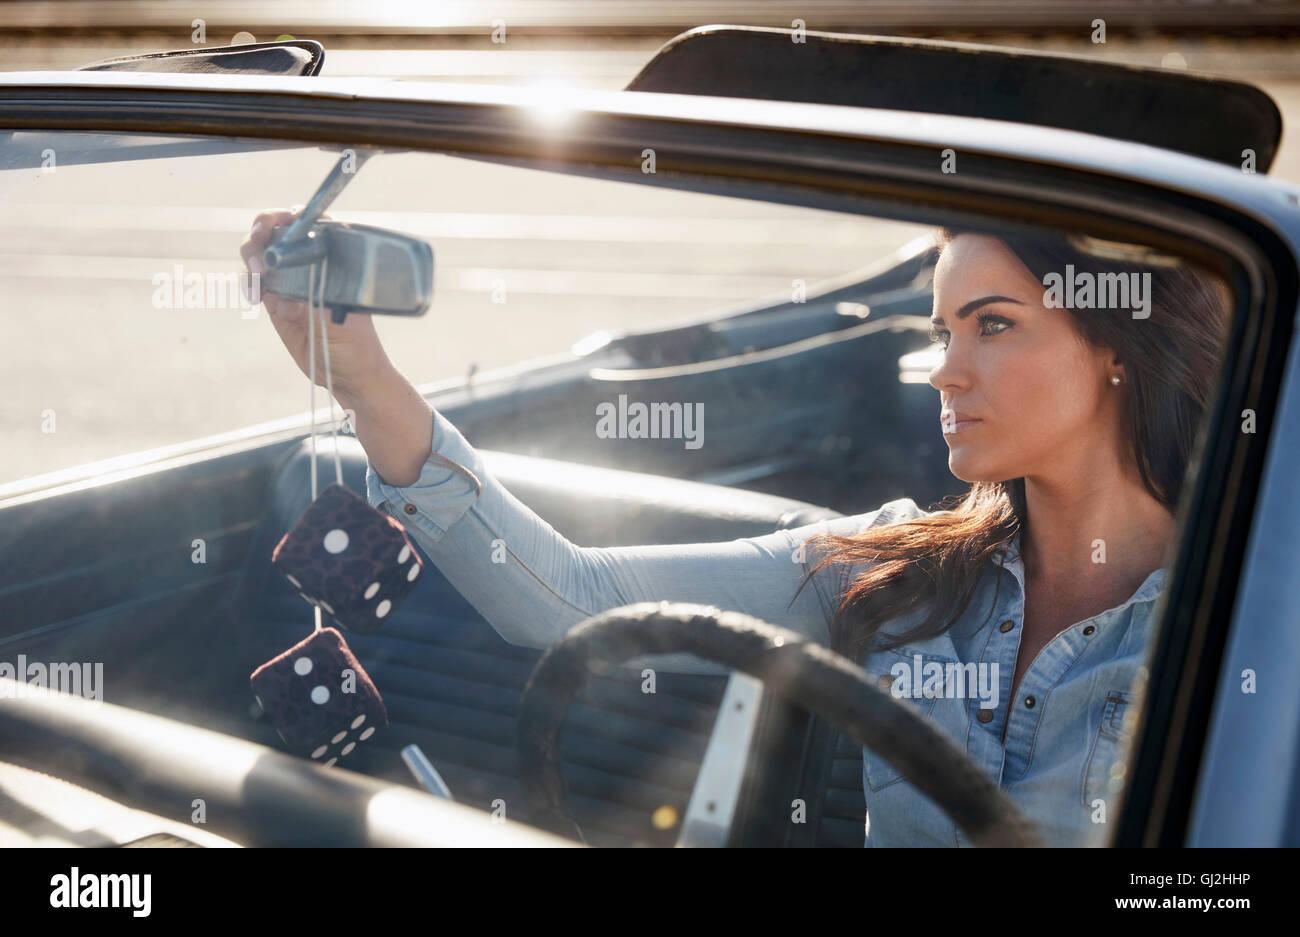 Woman in convertible car adjusting rear view mirror, Los Angeles, California, USA - Stock Image